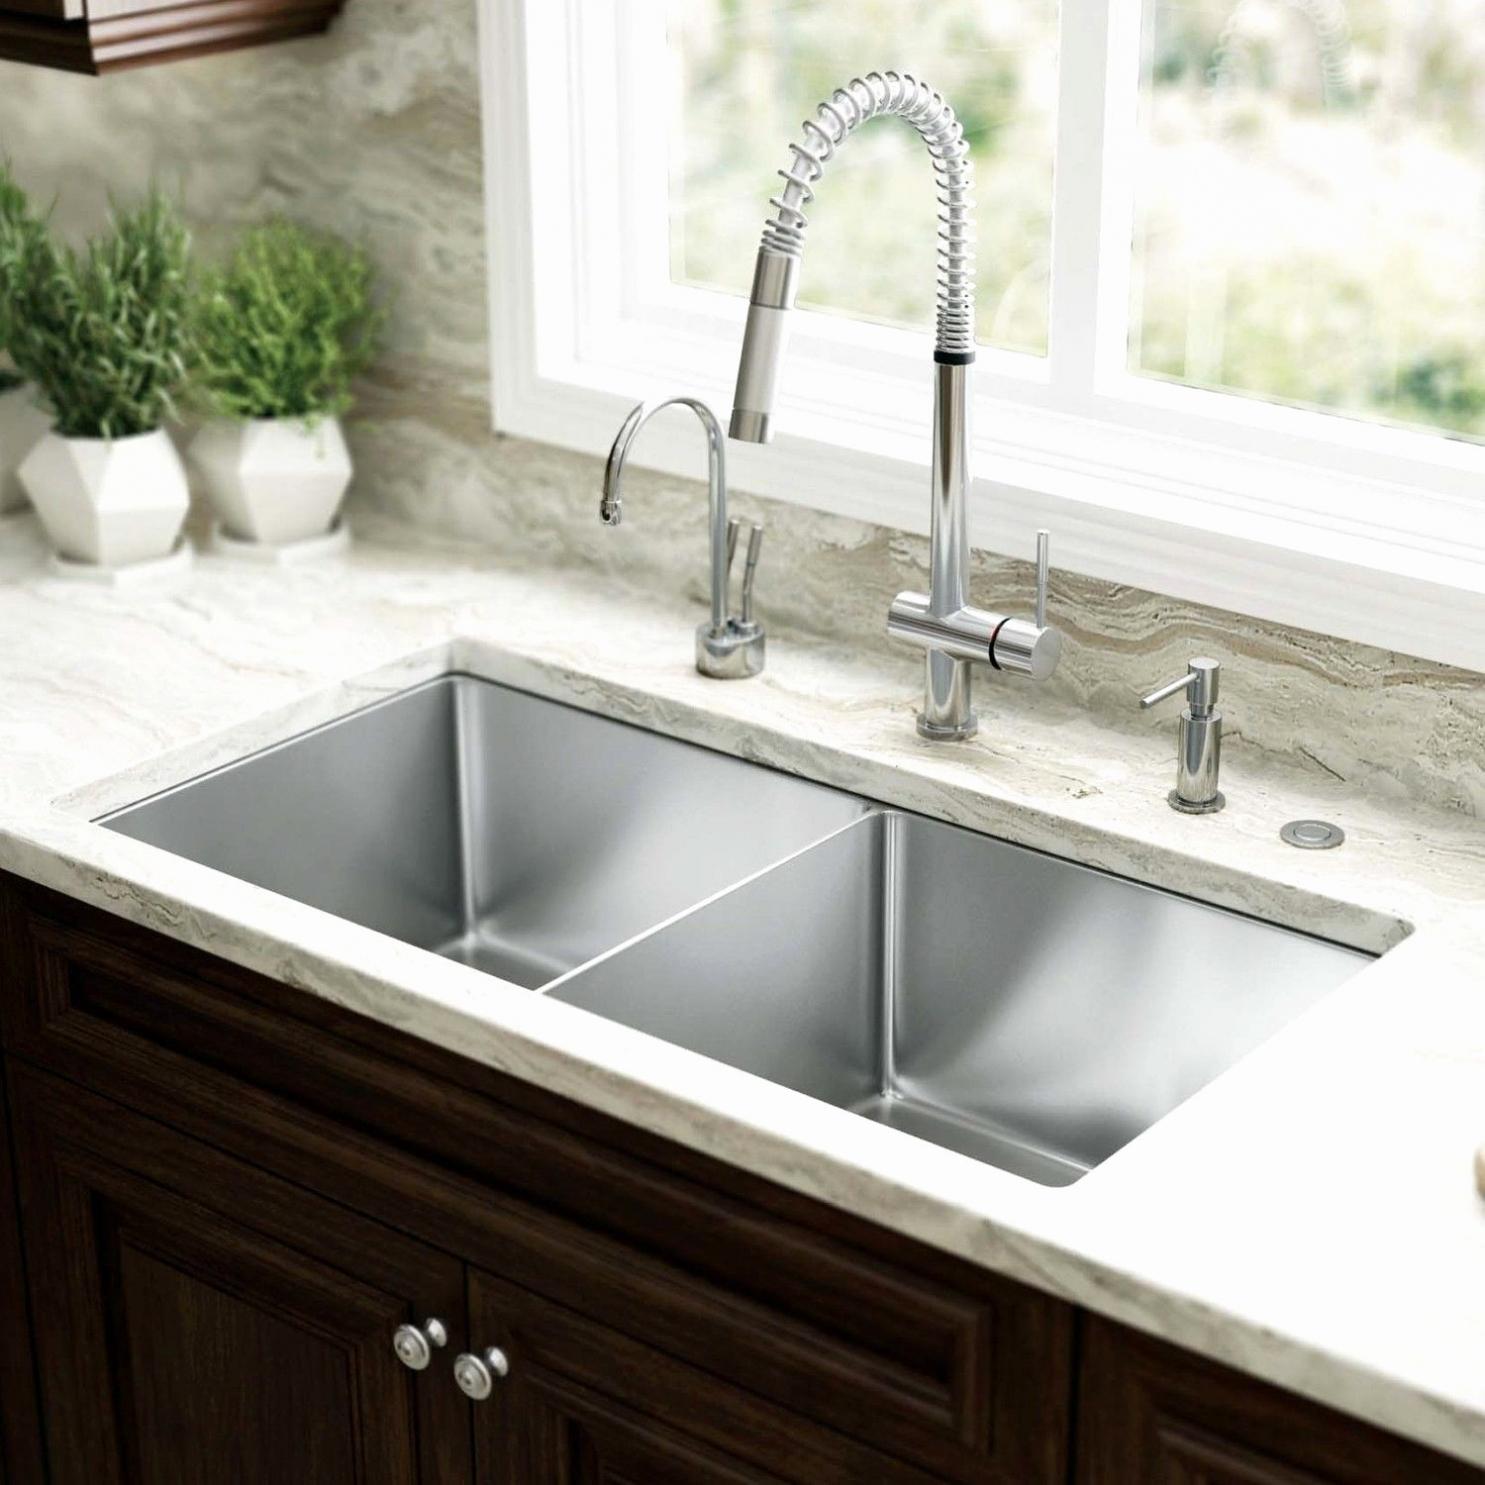 Sink Plumbing Diagram Kitchen Sink Plumbing Diagram New Under Sink Plumbing Diagram